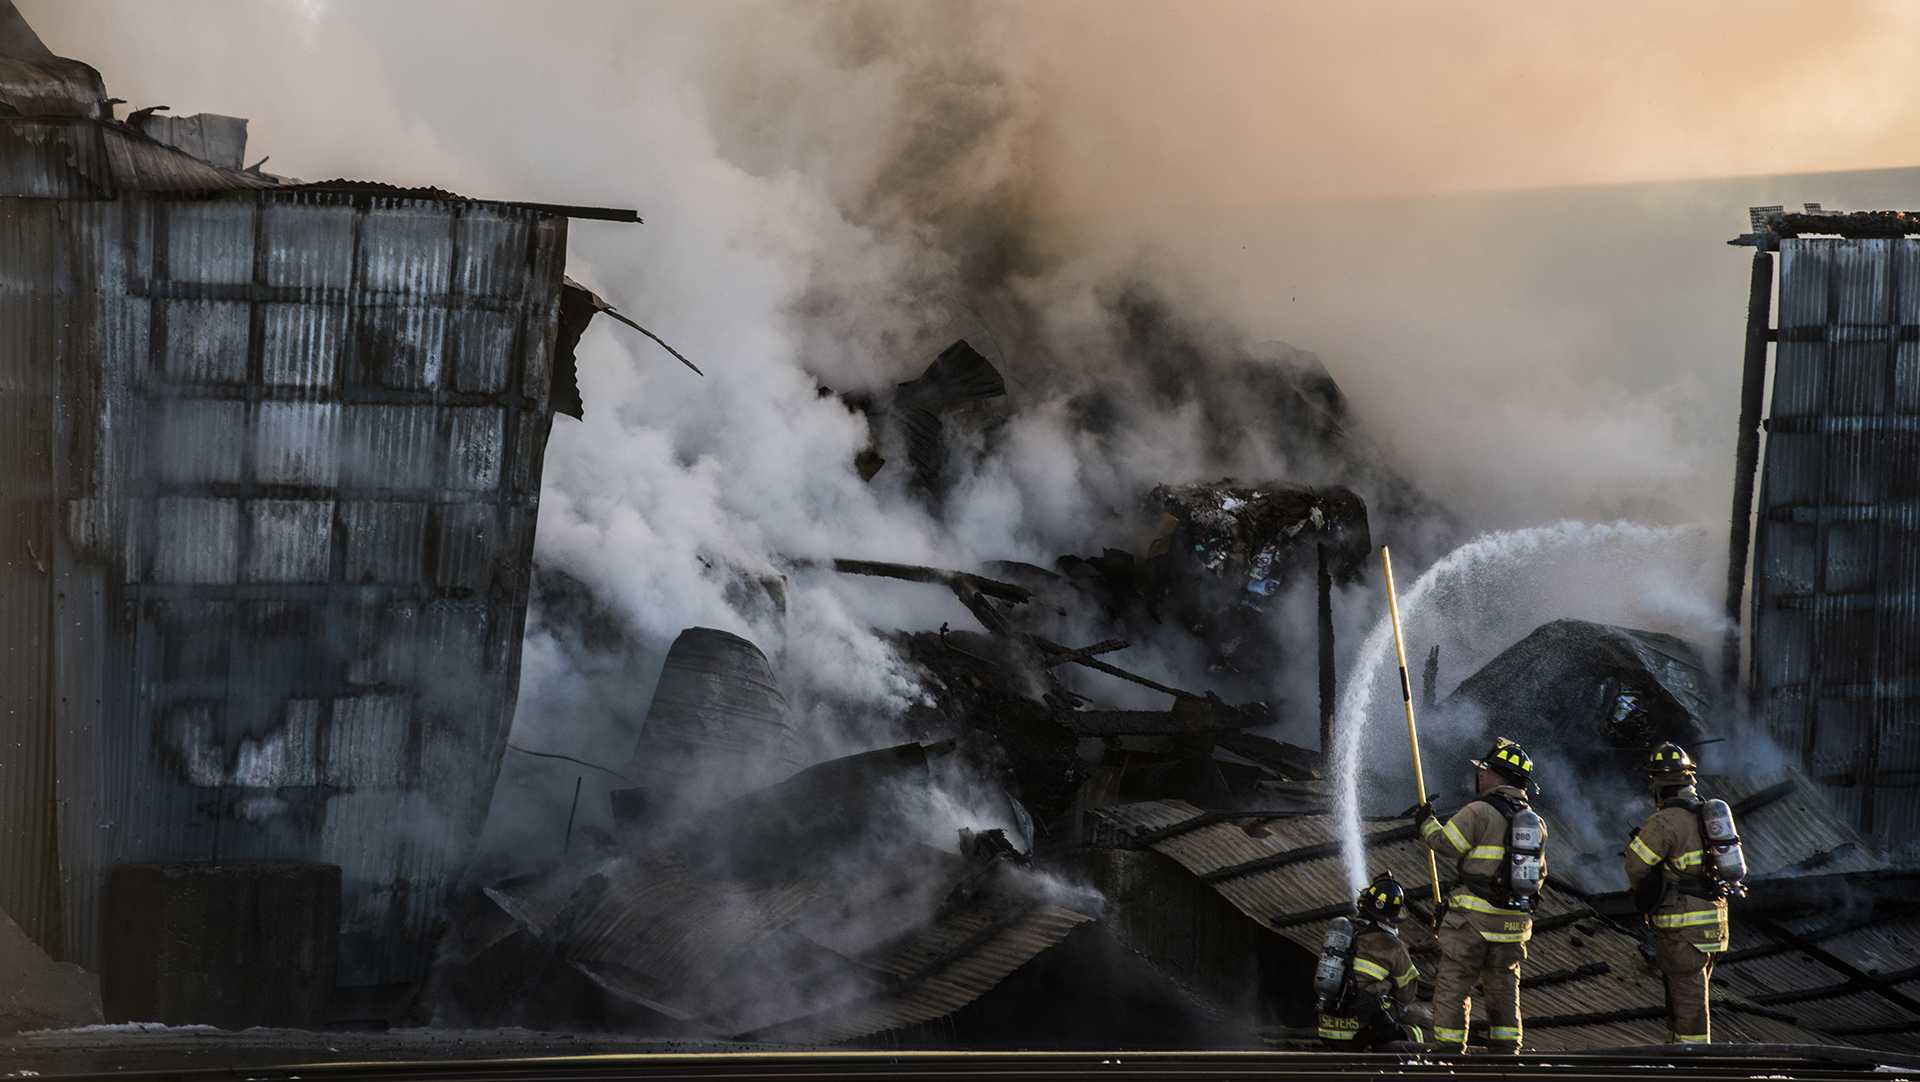 Emergency services respond to a fire at City Carton on Benton St. around 5 p.m. on Friday, Feb. 16,  2018. (Ben Allan Smith/The Daily Iowan)